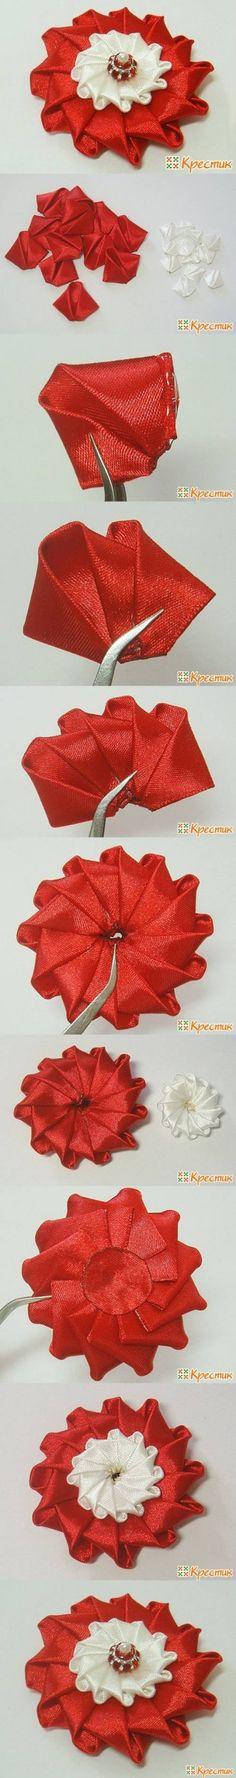 DIY Bright Satin Ribbon Flower DIY Projects